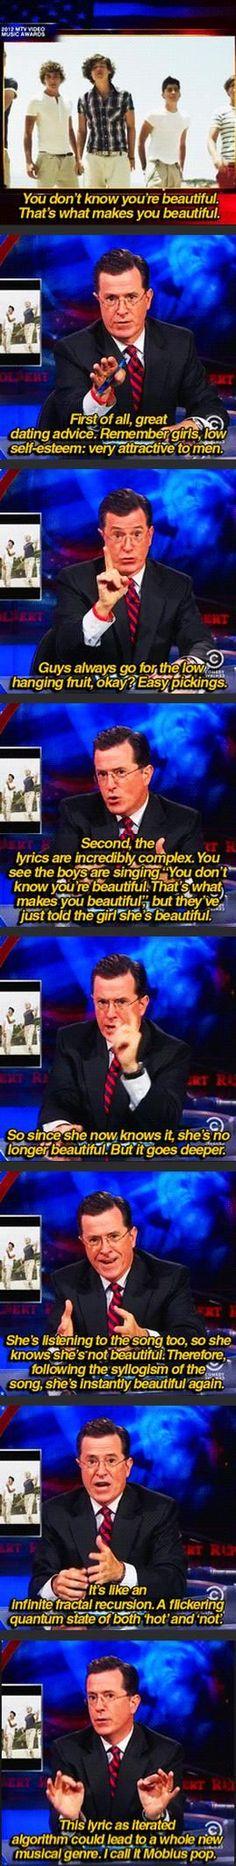 Colbert vs. One Direction